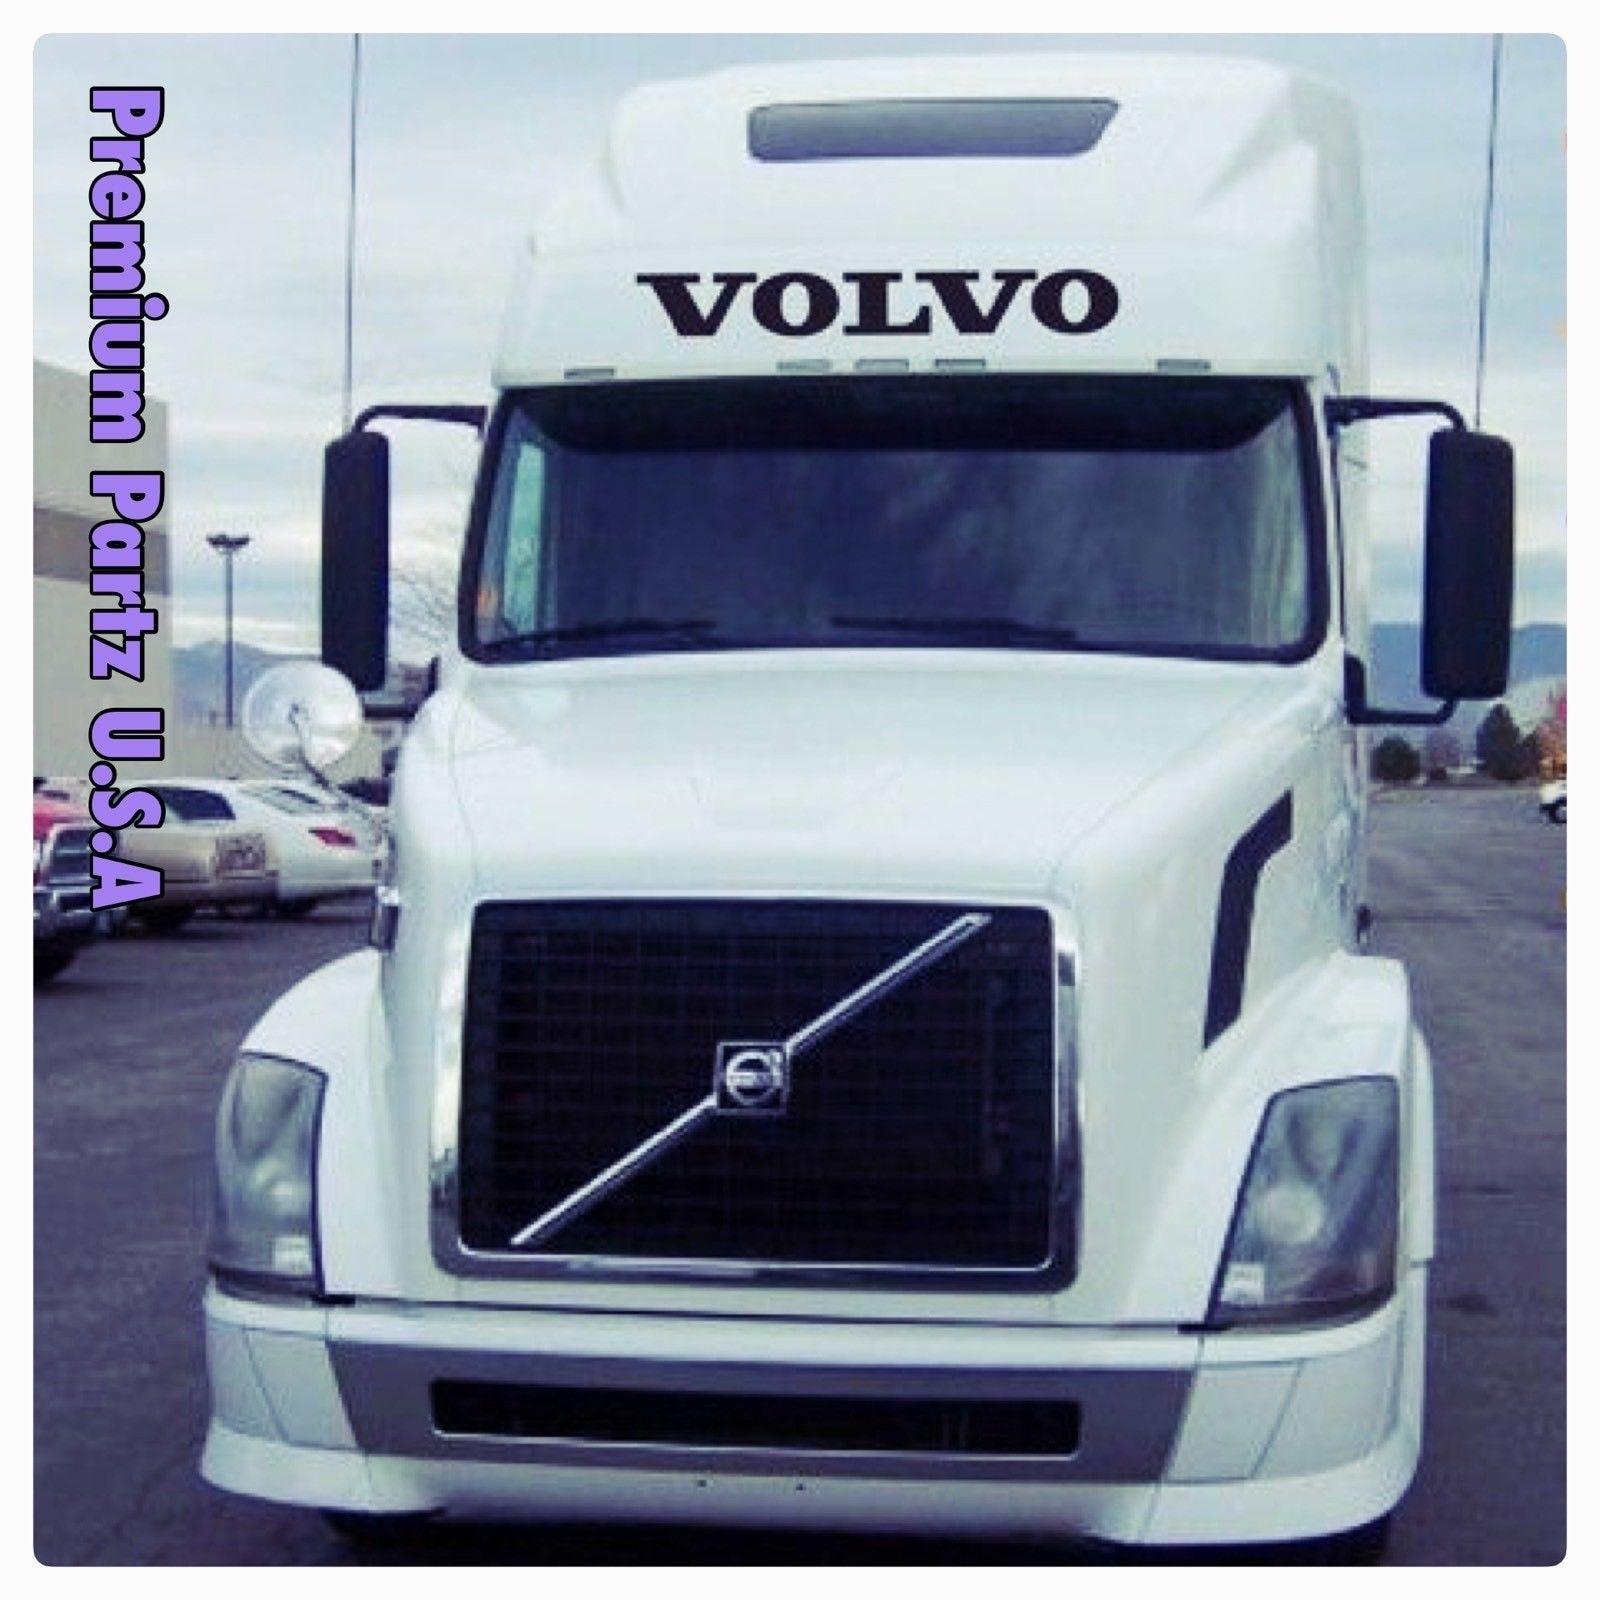 Volvo Daf Man Truck Side Window Stickers Decals Graphics set of 2